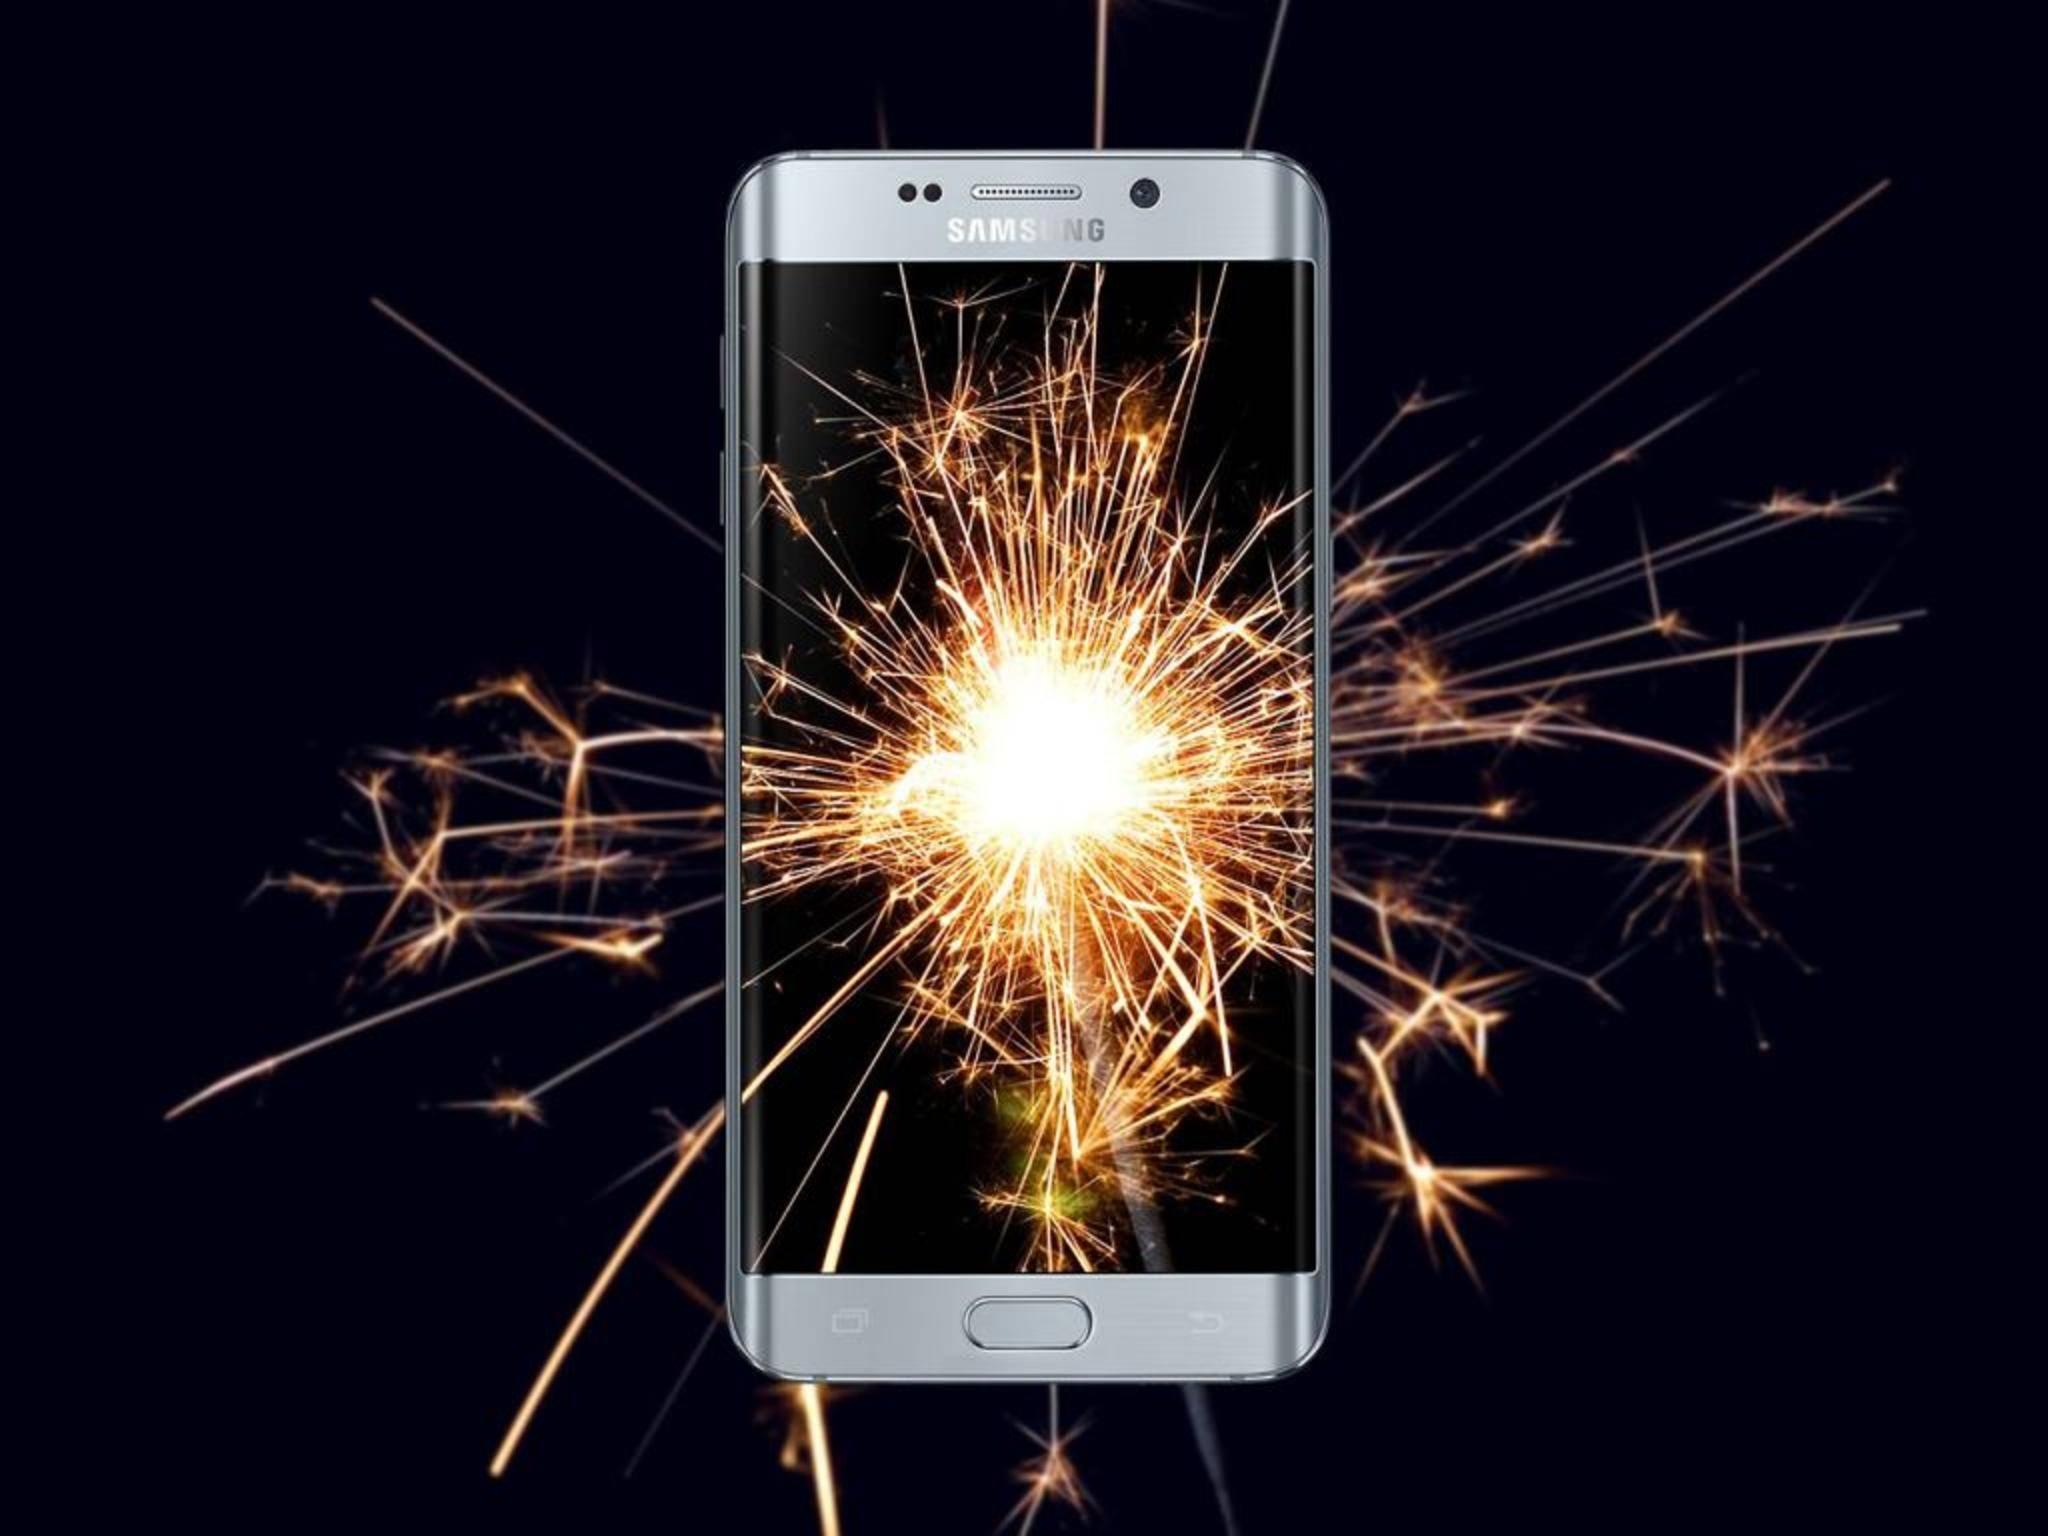 Das Galaxy Note 7 soll dem Galaxy S6 Edge Plus ähneln.